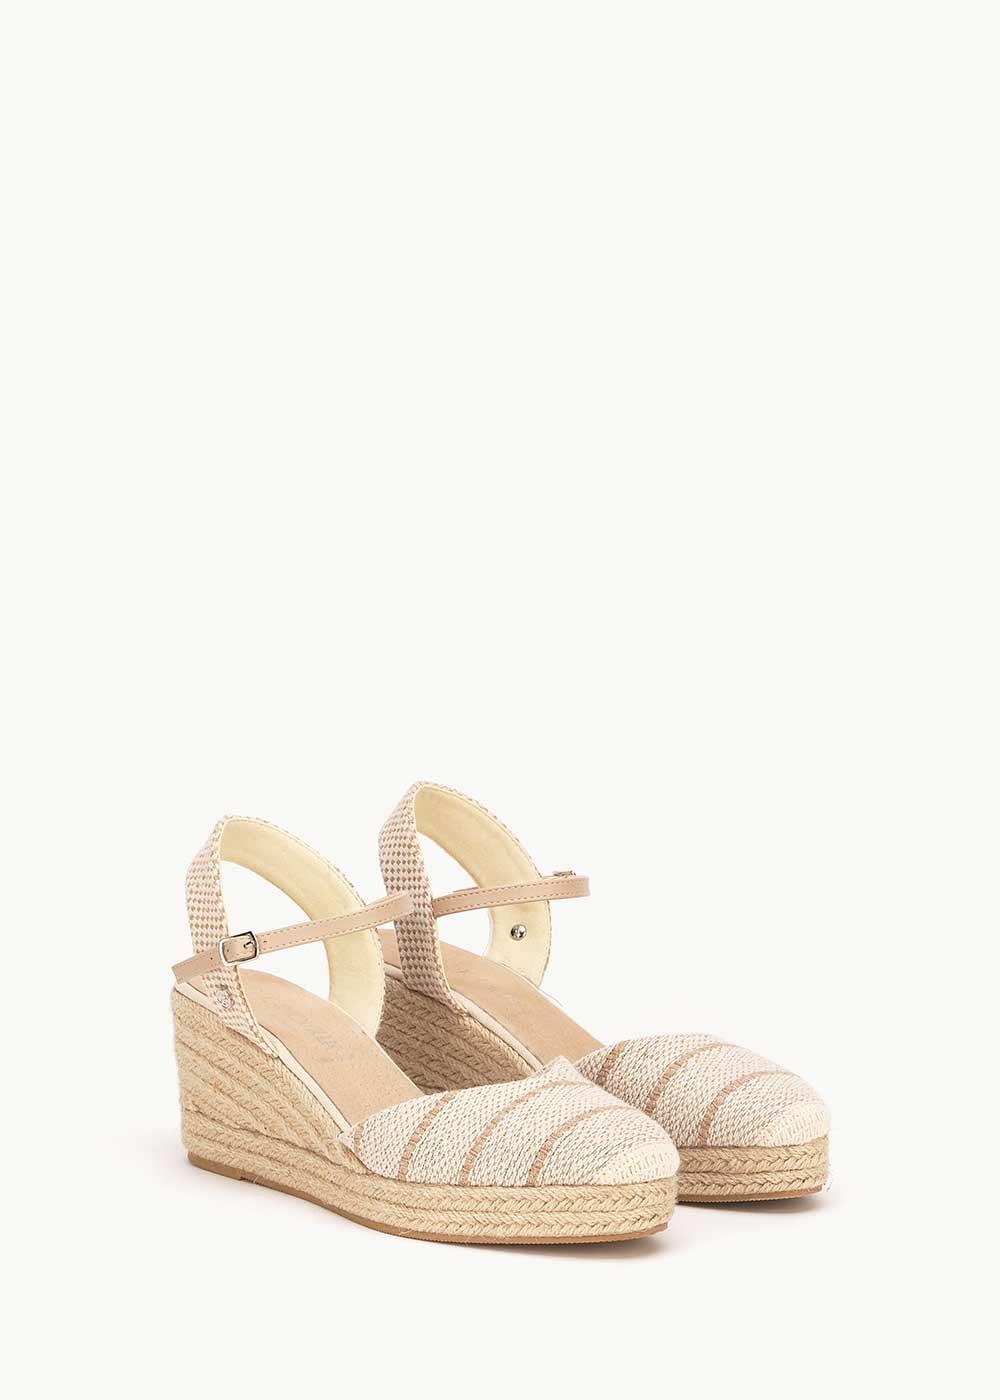 Sandalo Stacy modello espadrillas - Light Beige - Donna